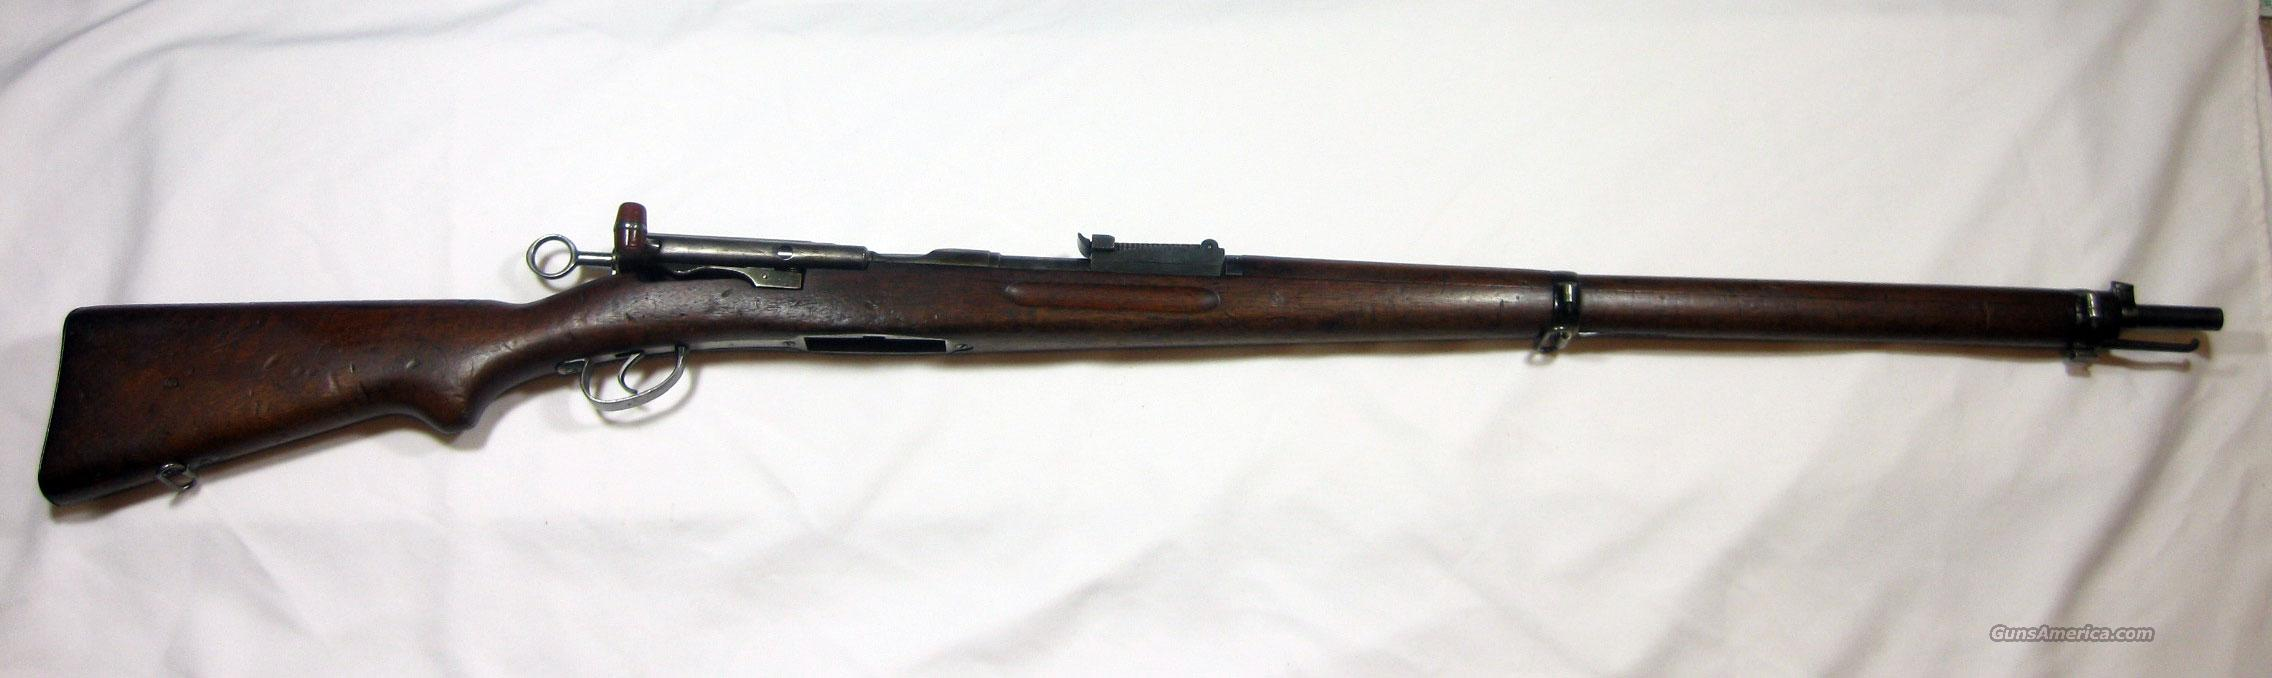 Swiss Schmit Ruben 1911 7.5x55  Guns > Rifles > Military Misc. Rifles Non-US > Shmidt Rubin